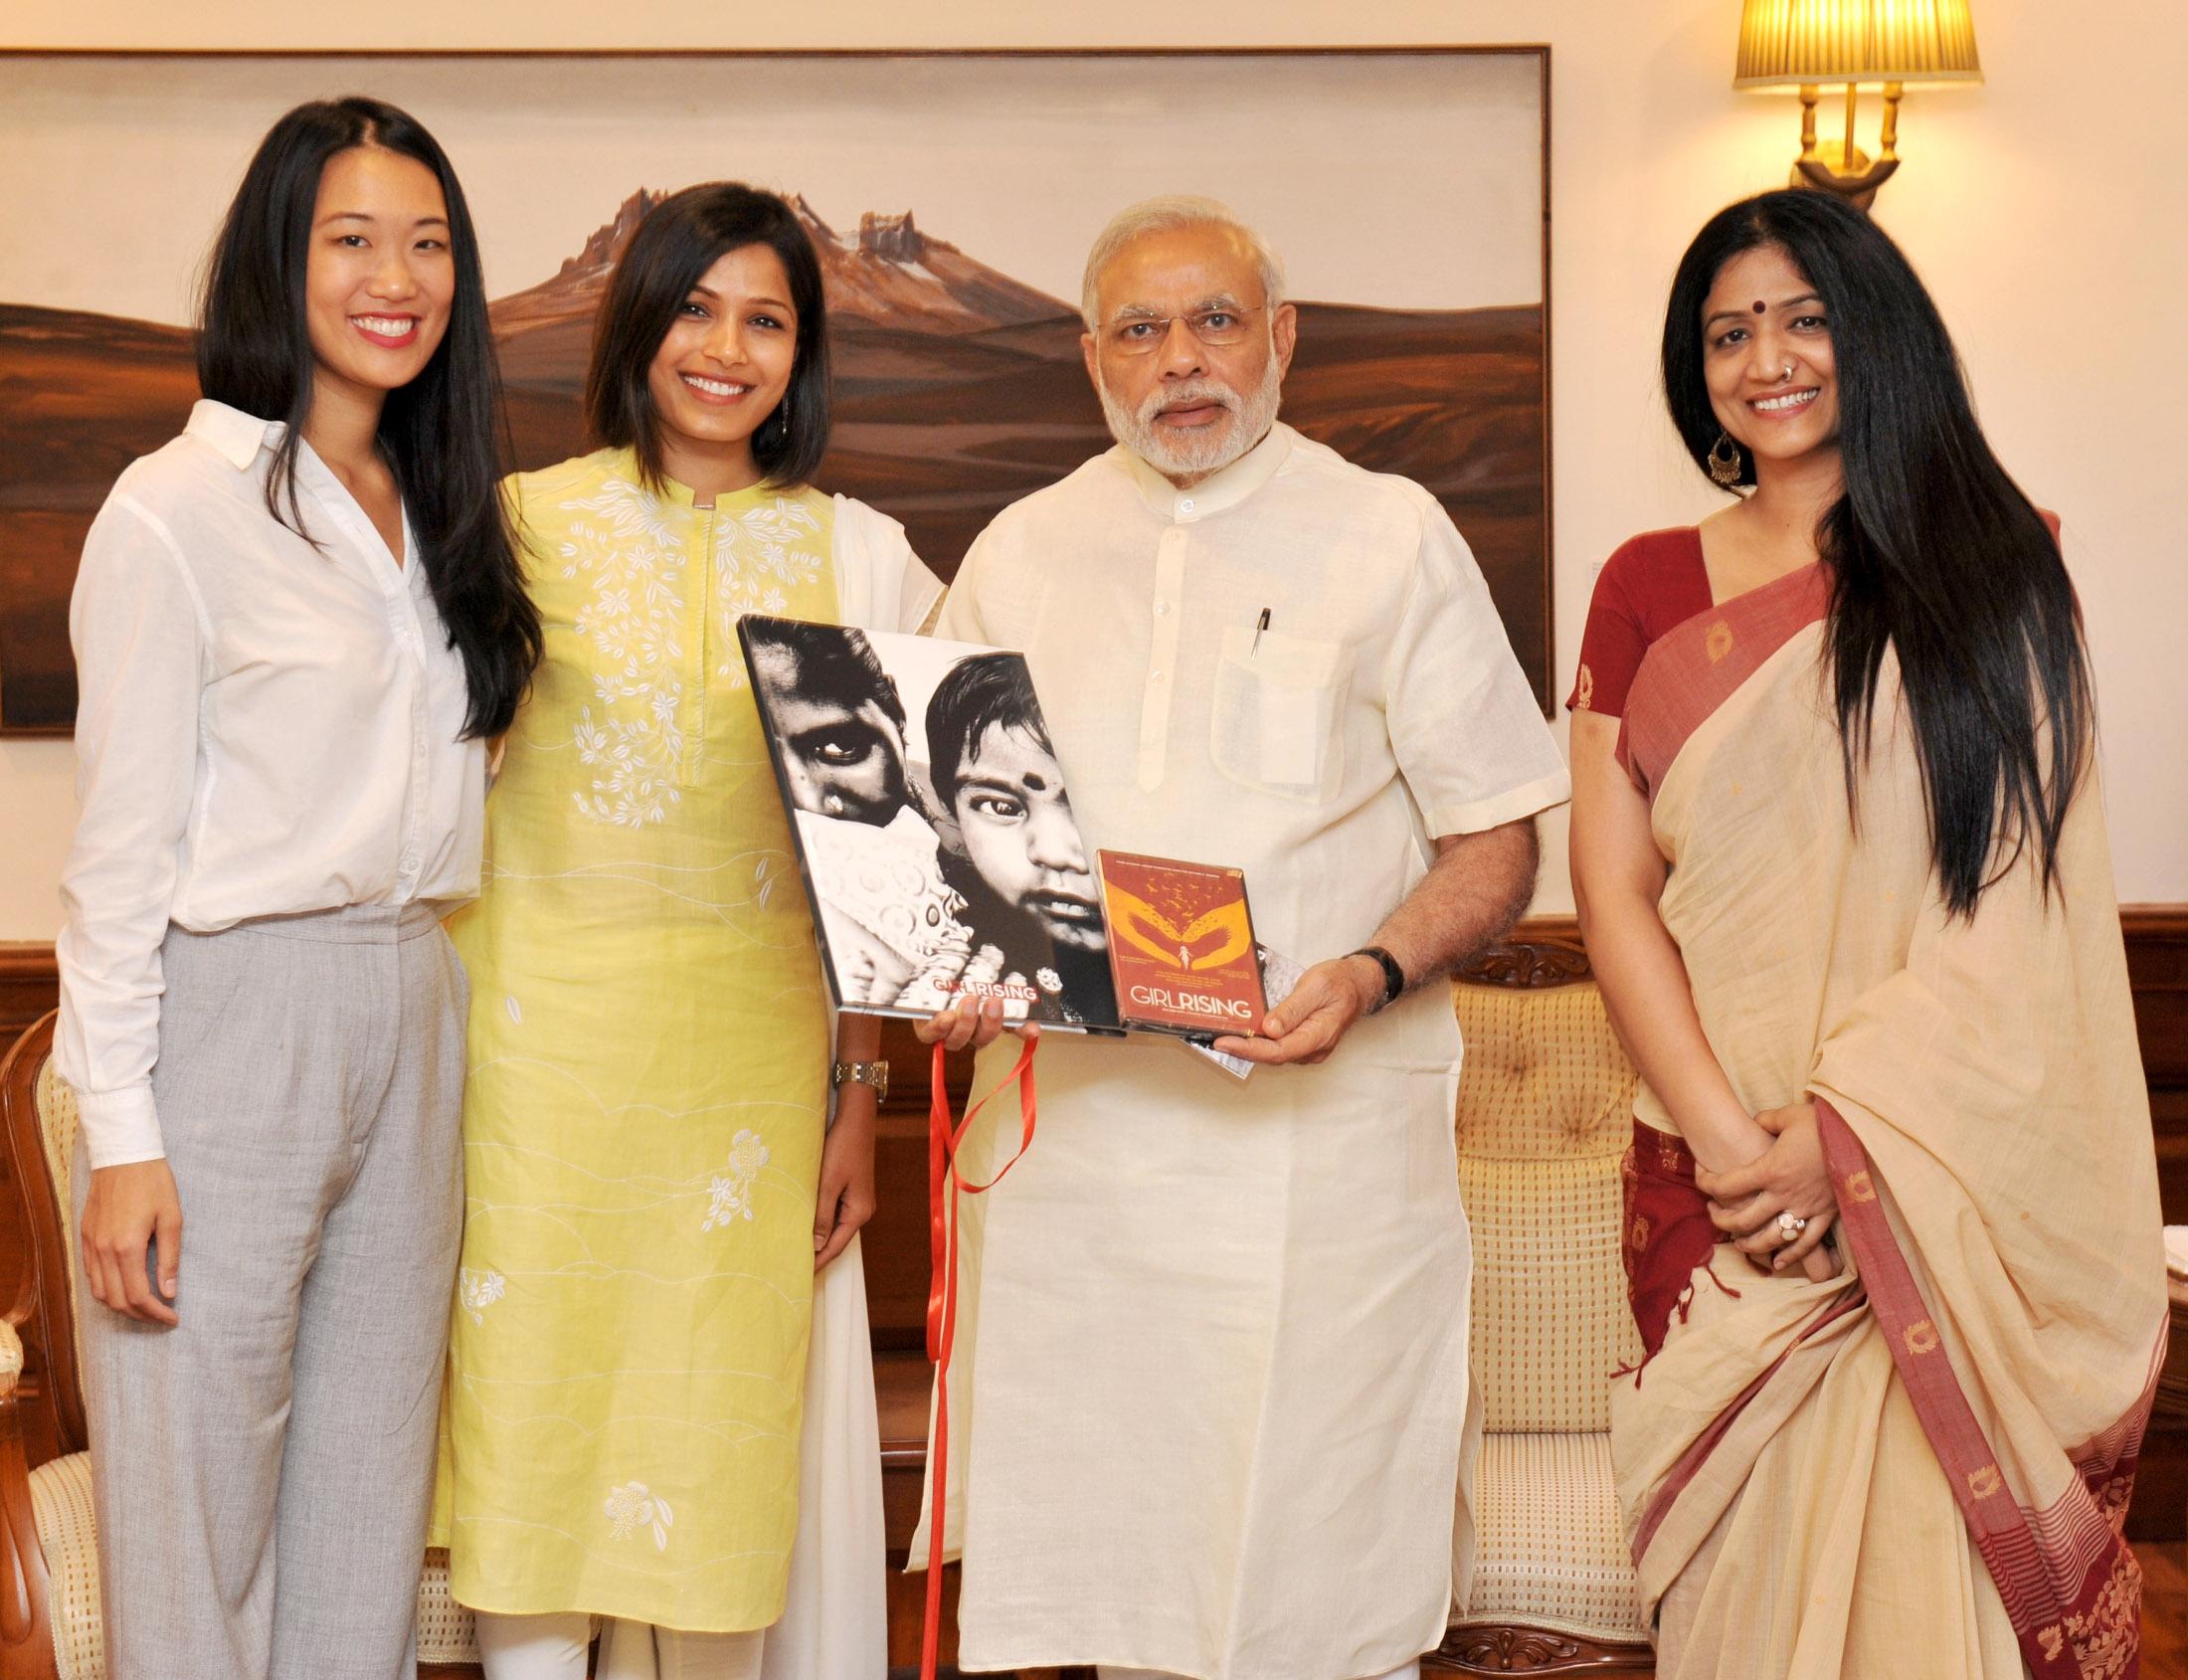 Prime Minister Modi, Freida Pinto, and the Girl Rising Team.